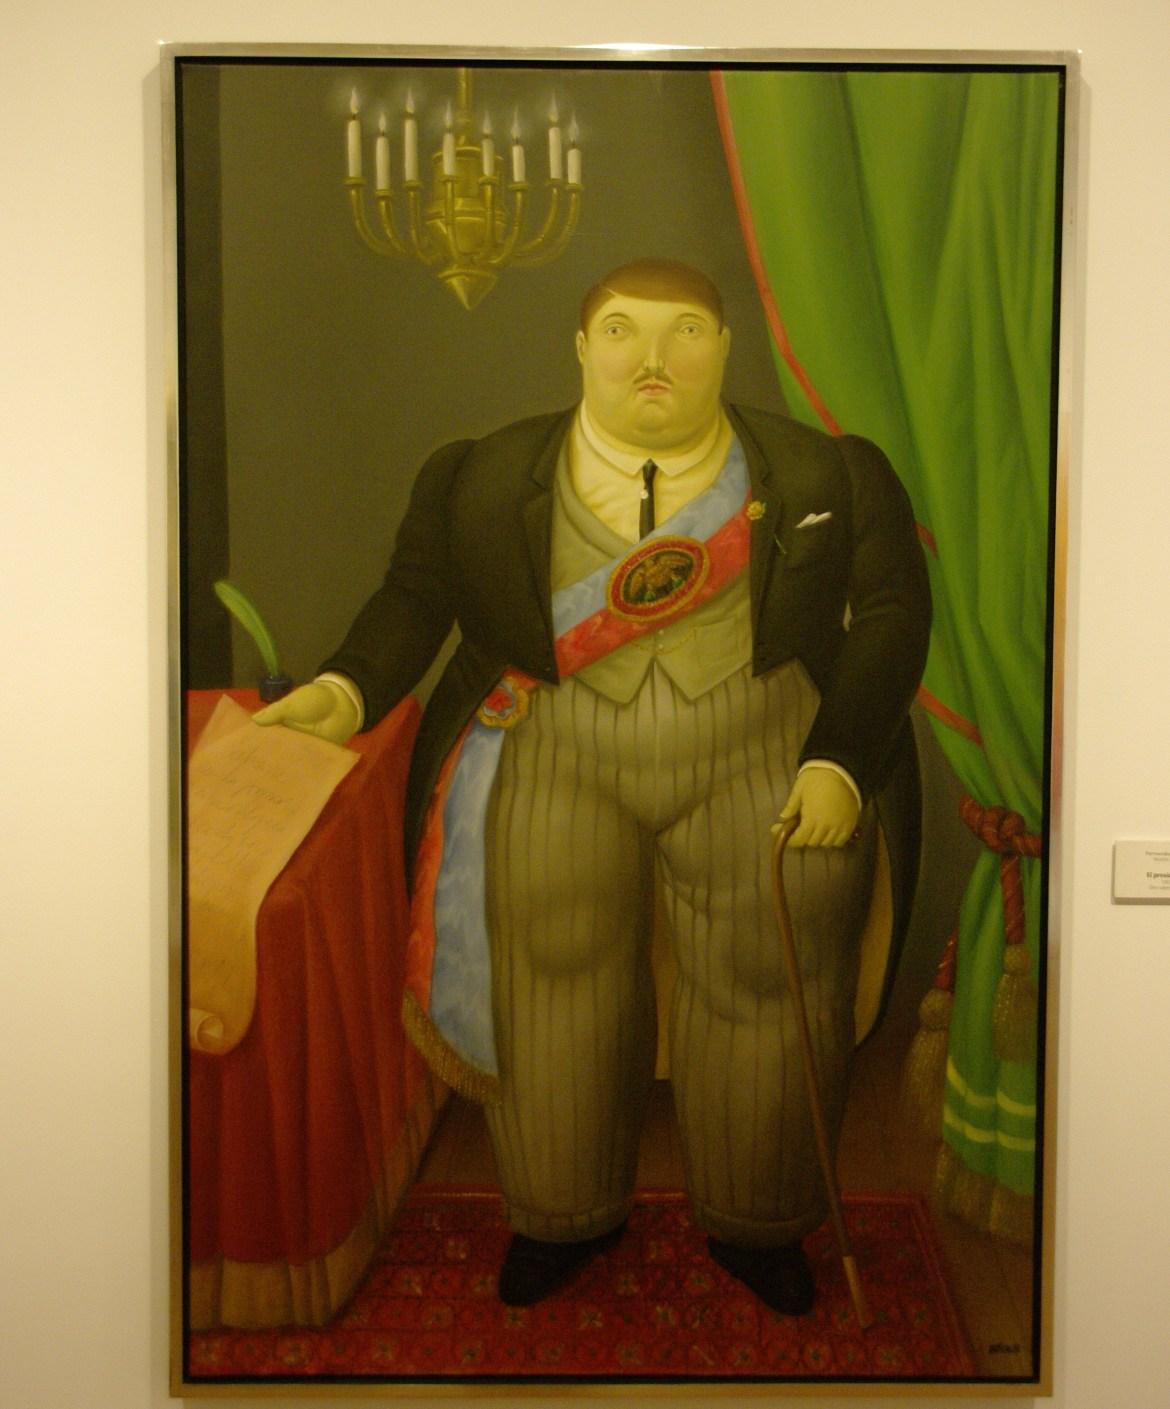 igp1944 e1514885074752 - Bogota - stolica Kolumbii